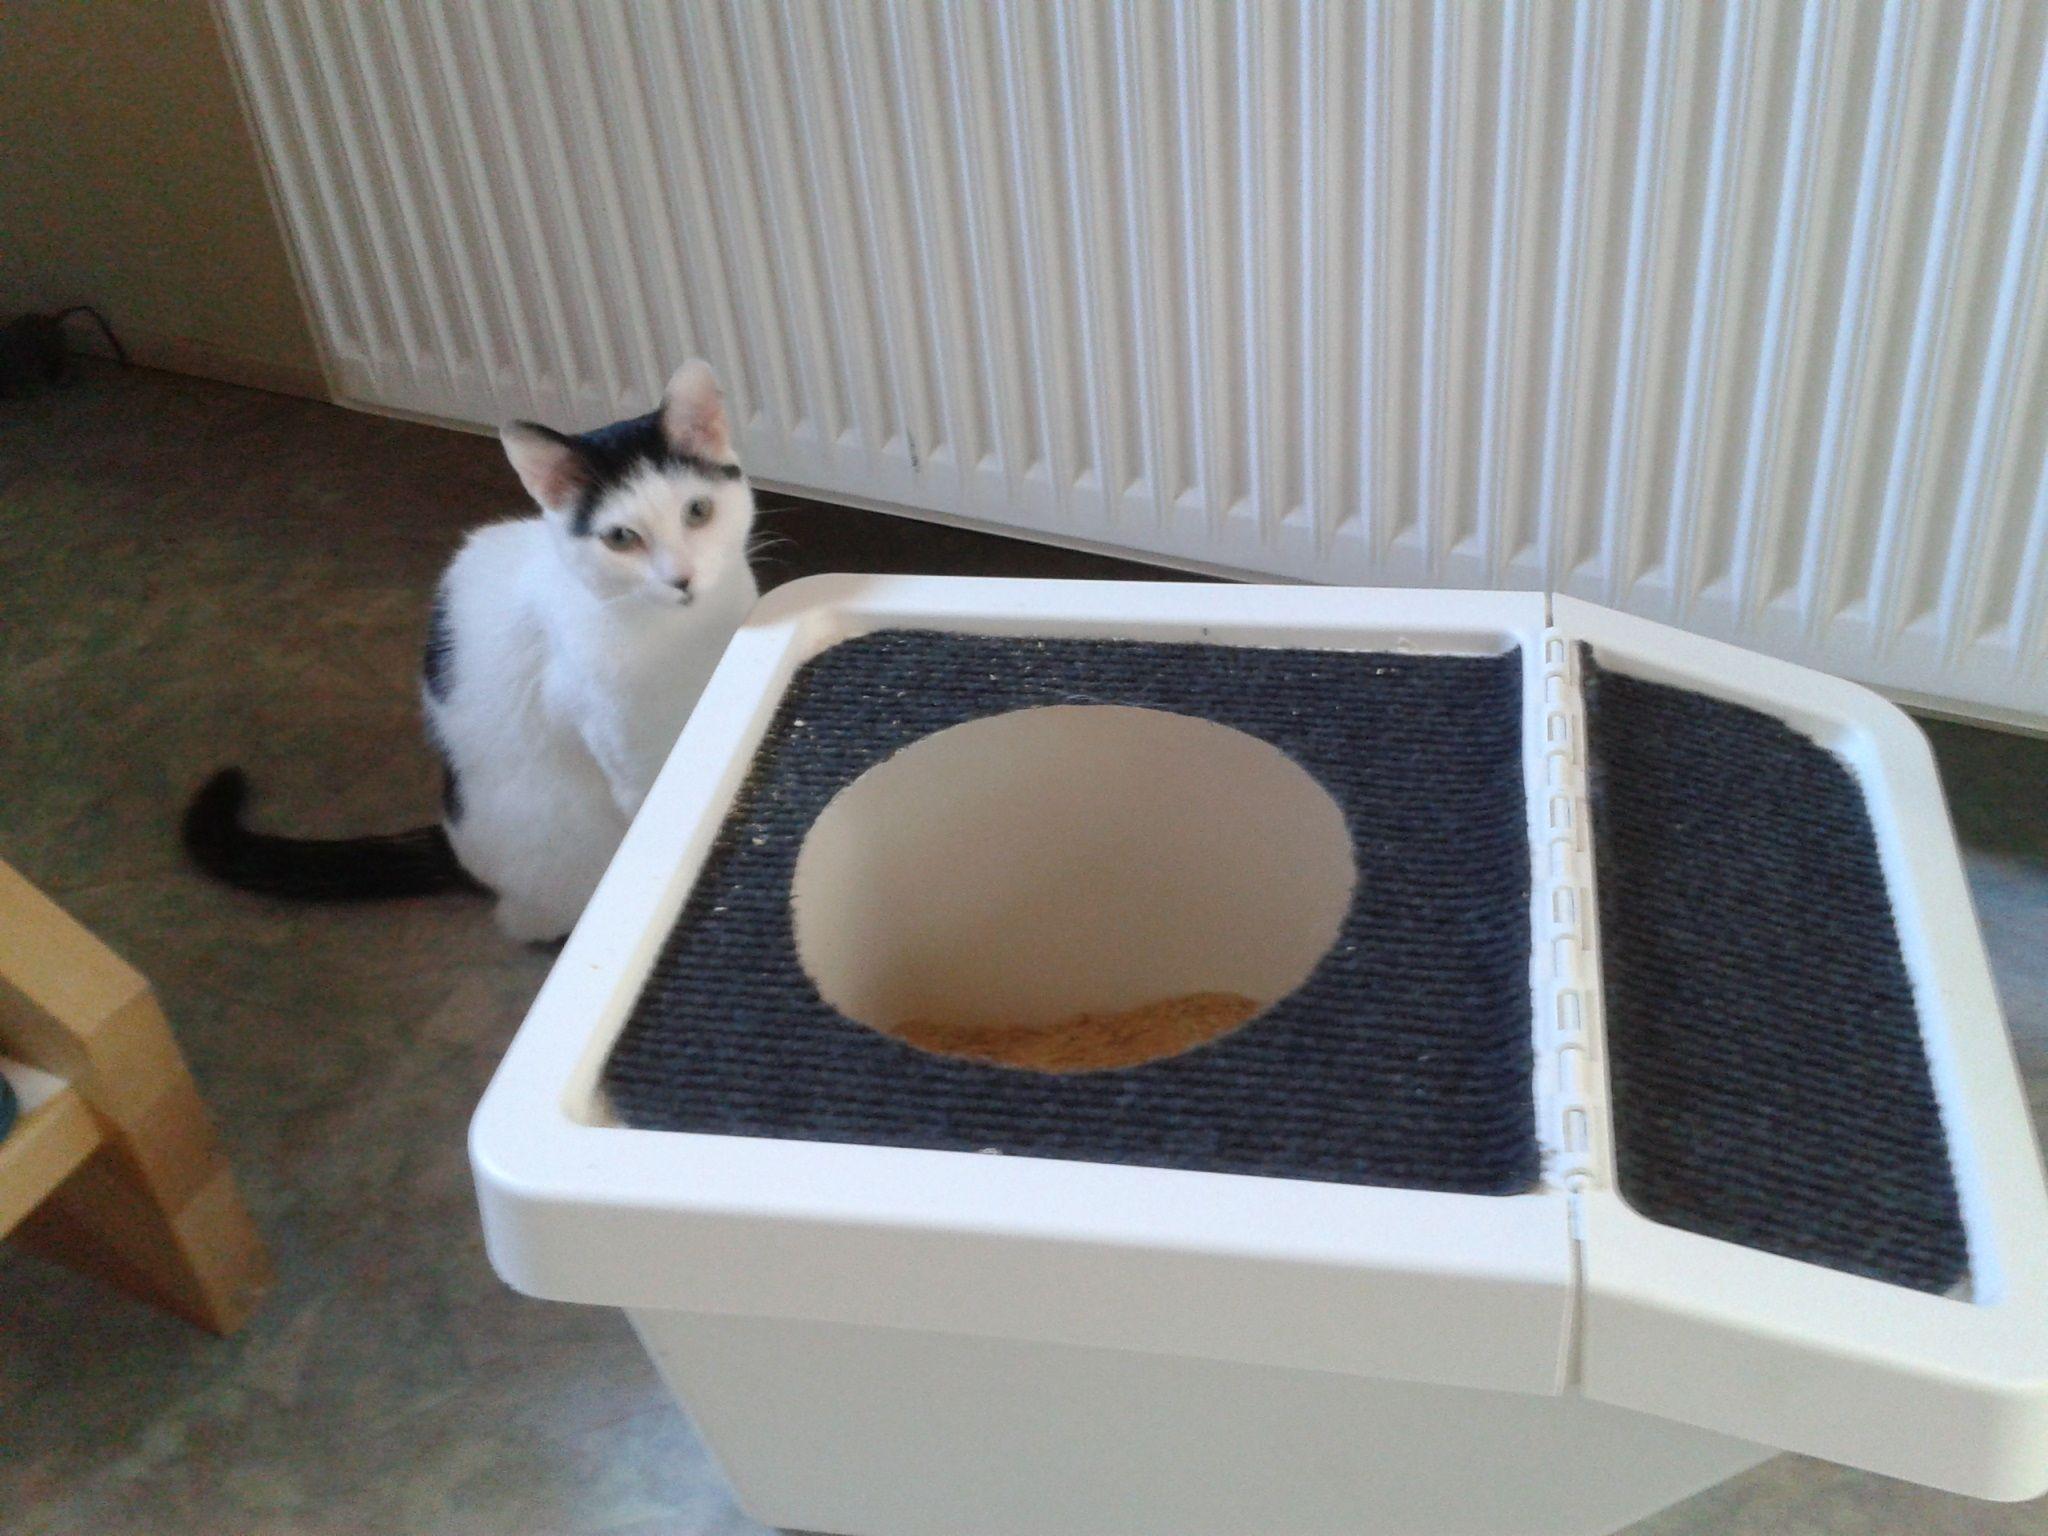 Top Entrance Litter Box With Sortera Ikea Hackers Diy Litter Box Ikea Hacks For Cats Ikea Cat